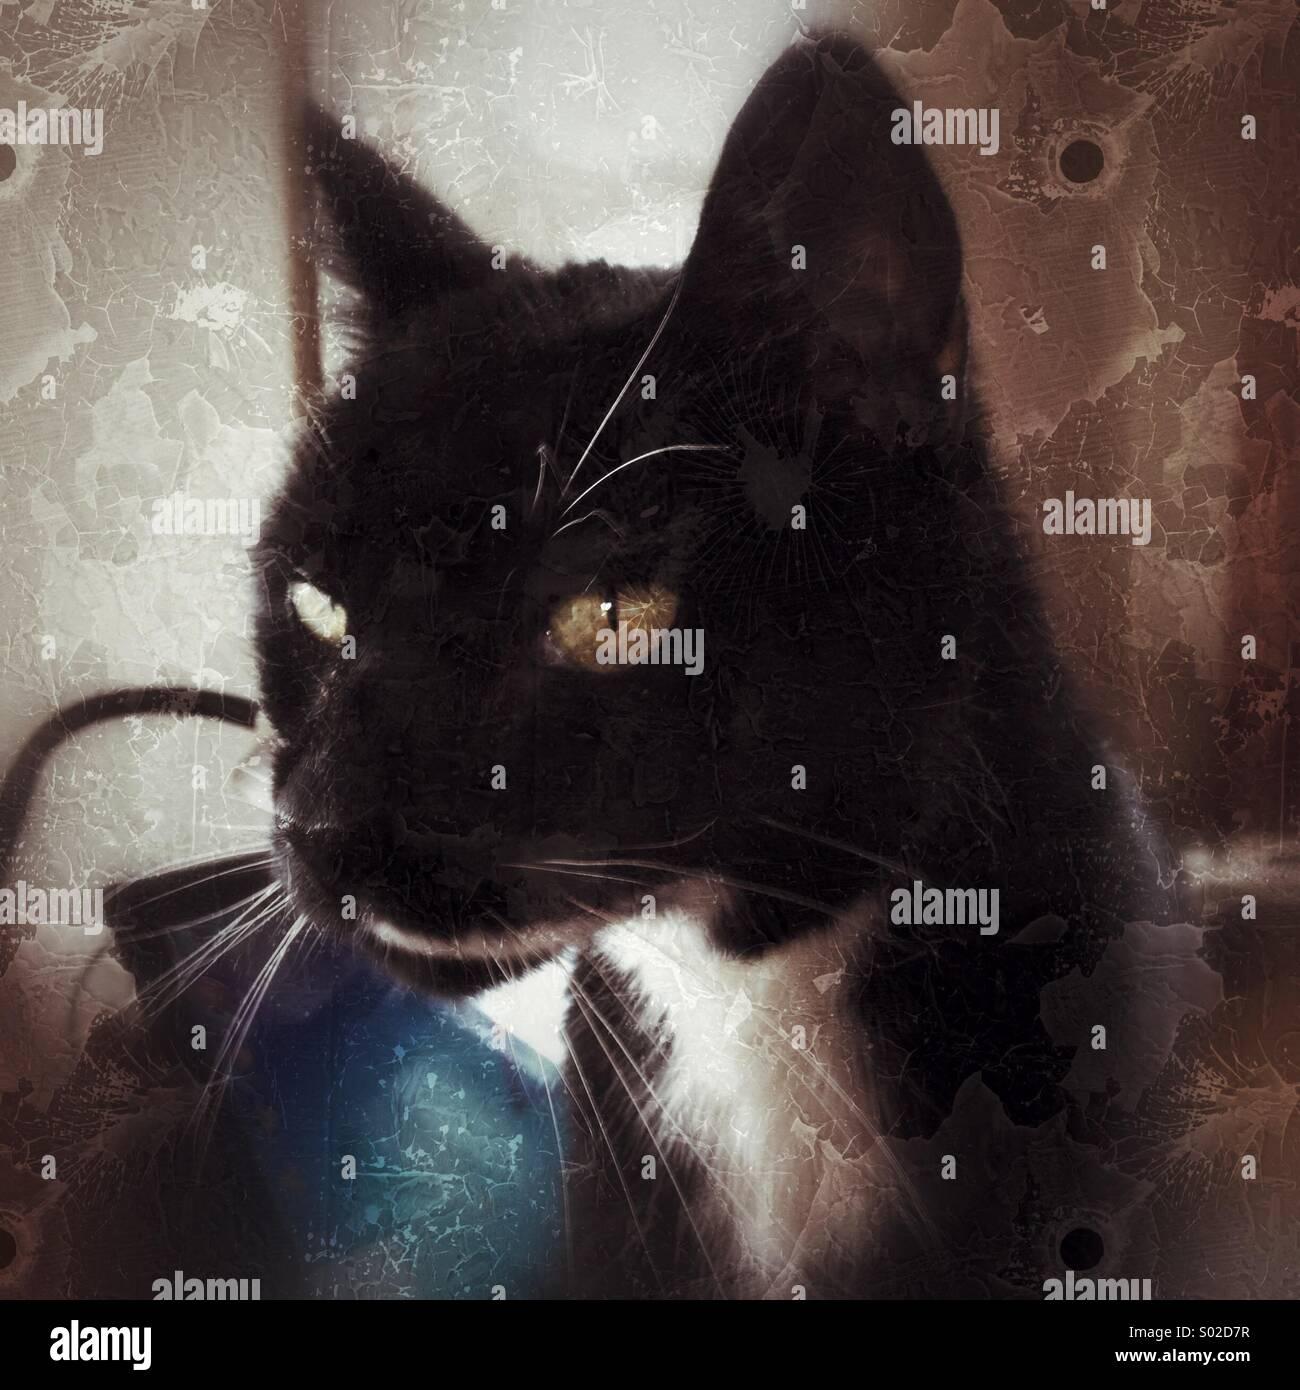 Katze sitzt auf dem computer Stockbild